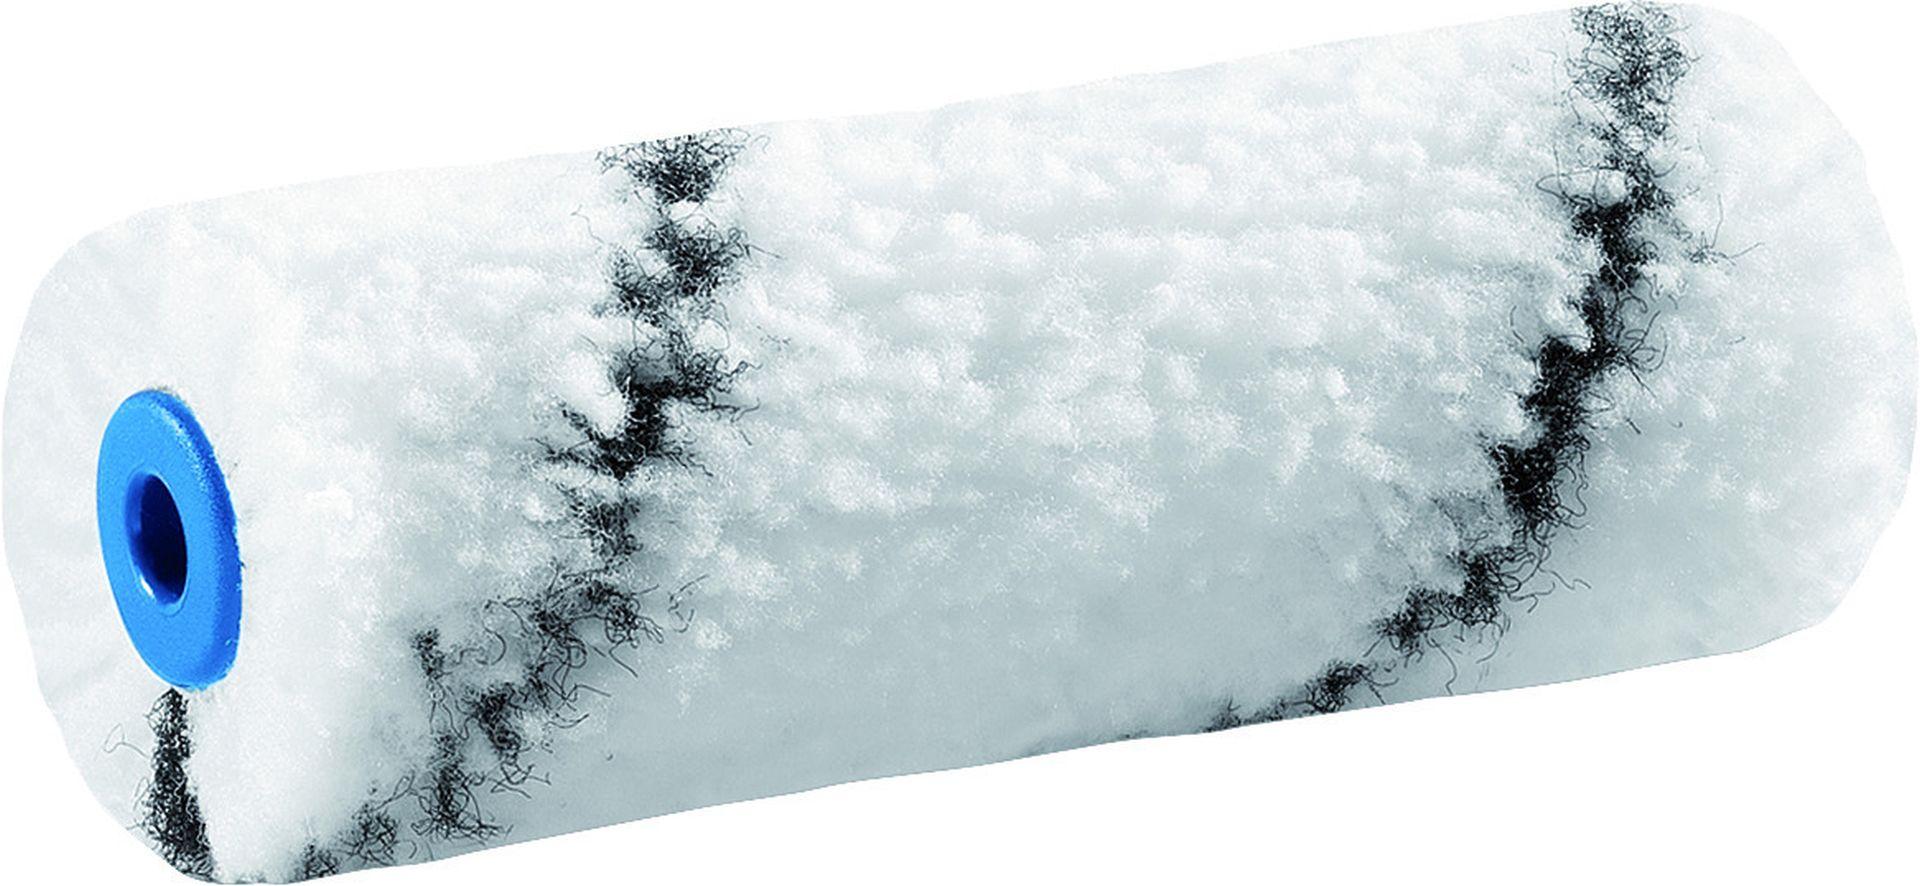 STORCH Walze, 10 cm, Polyester13, Schwarzfaden, Kern-Ø 16 mm, im 2er Pack